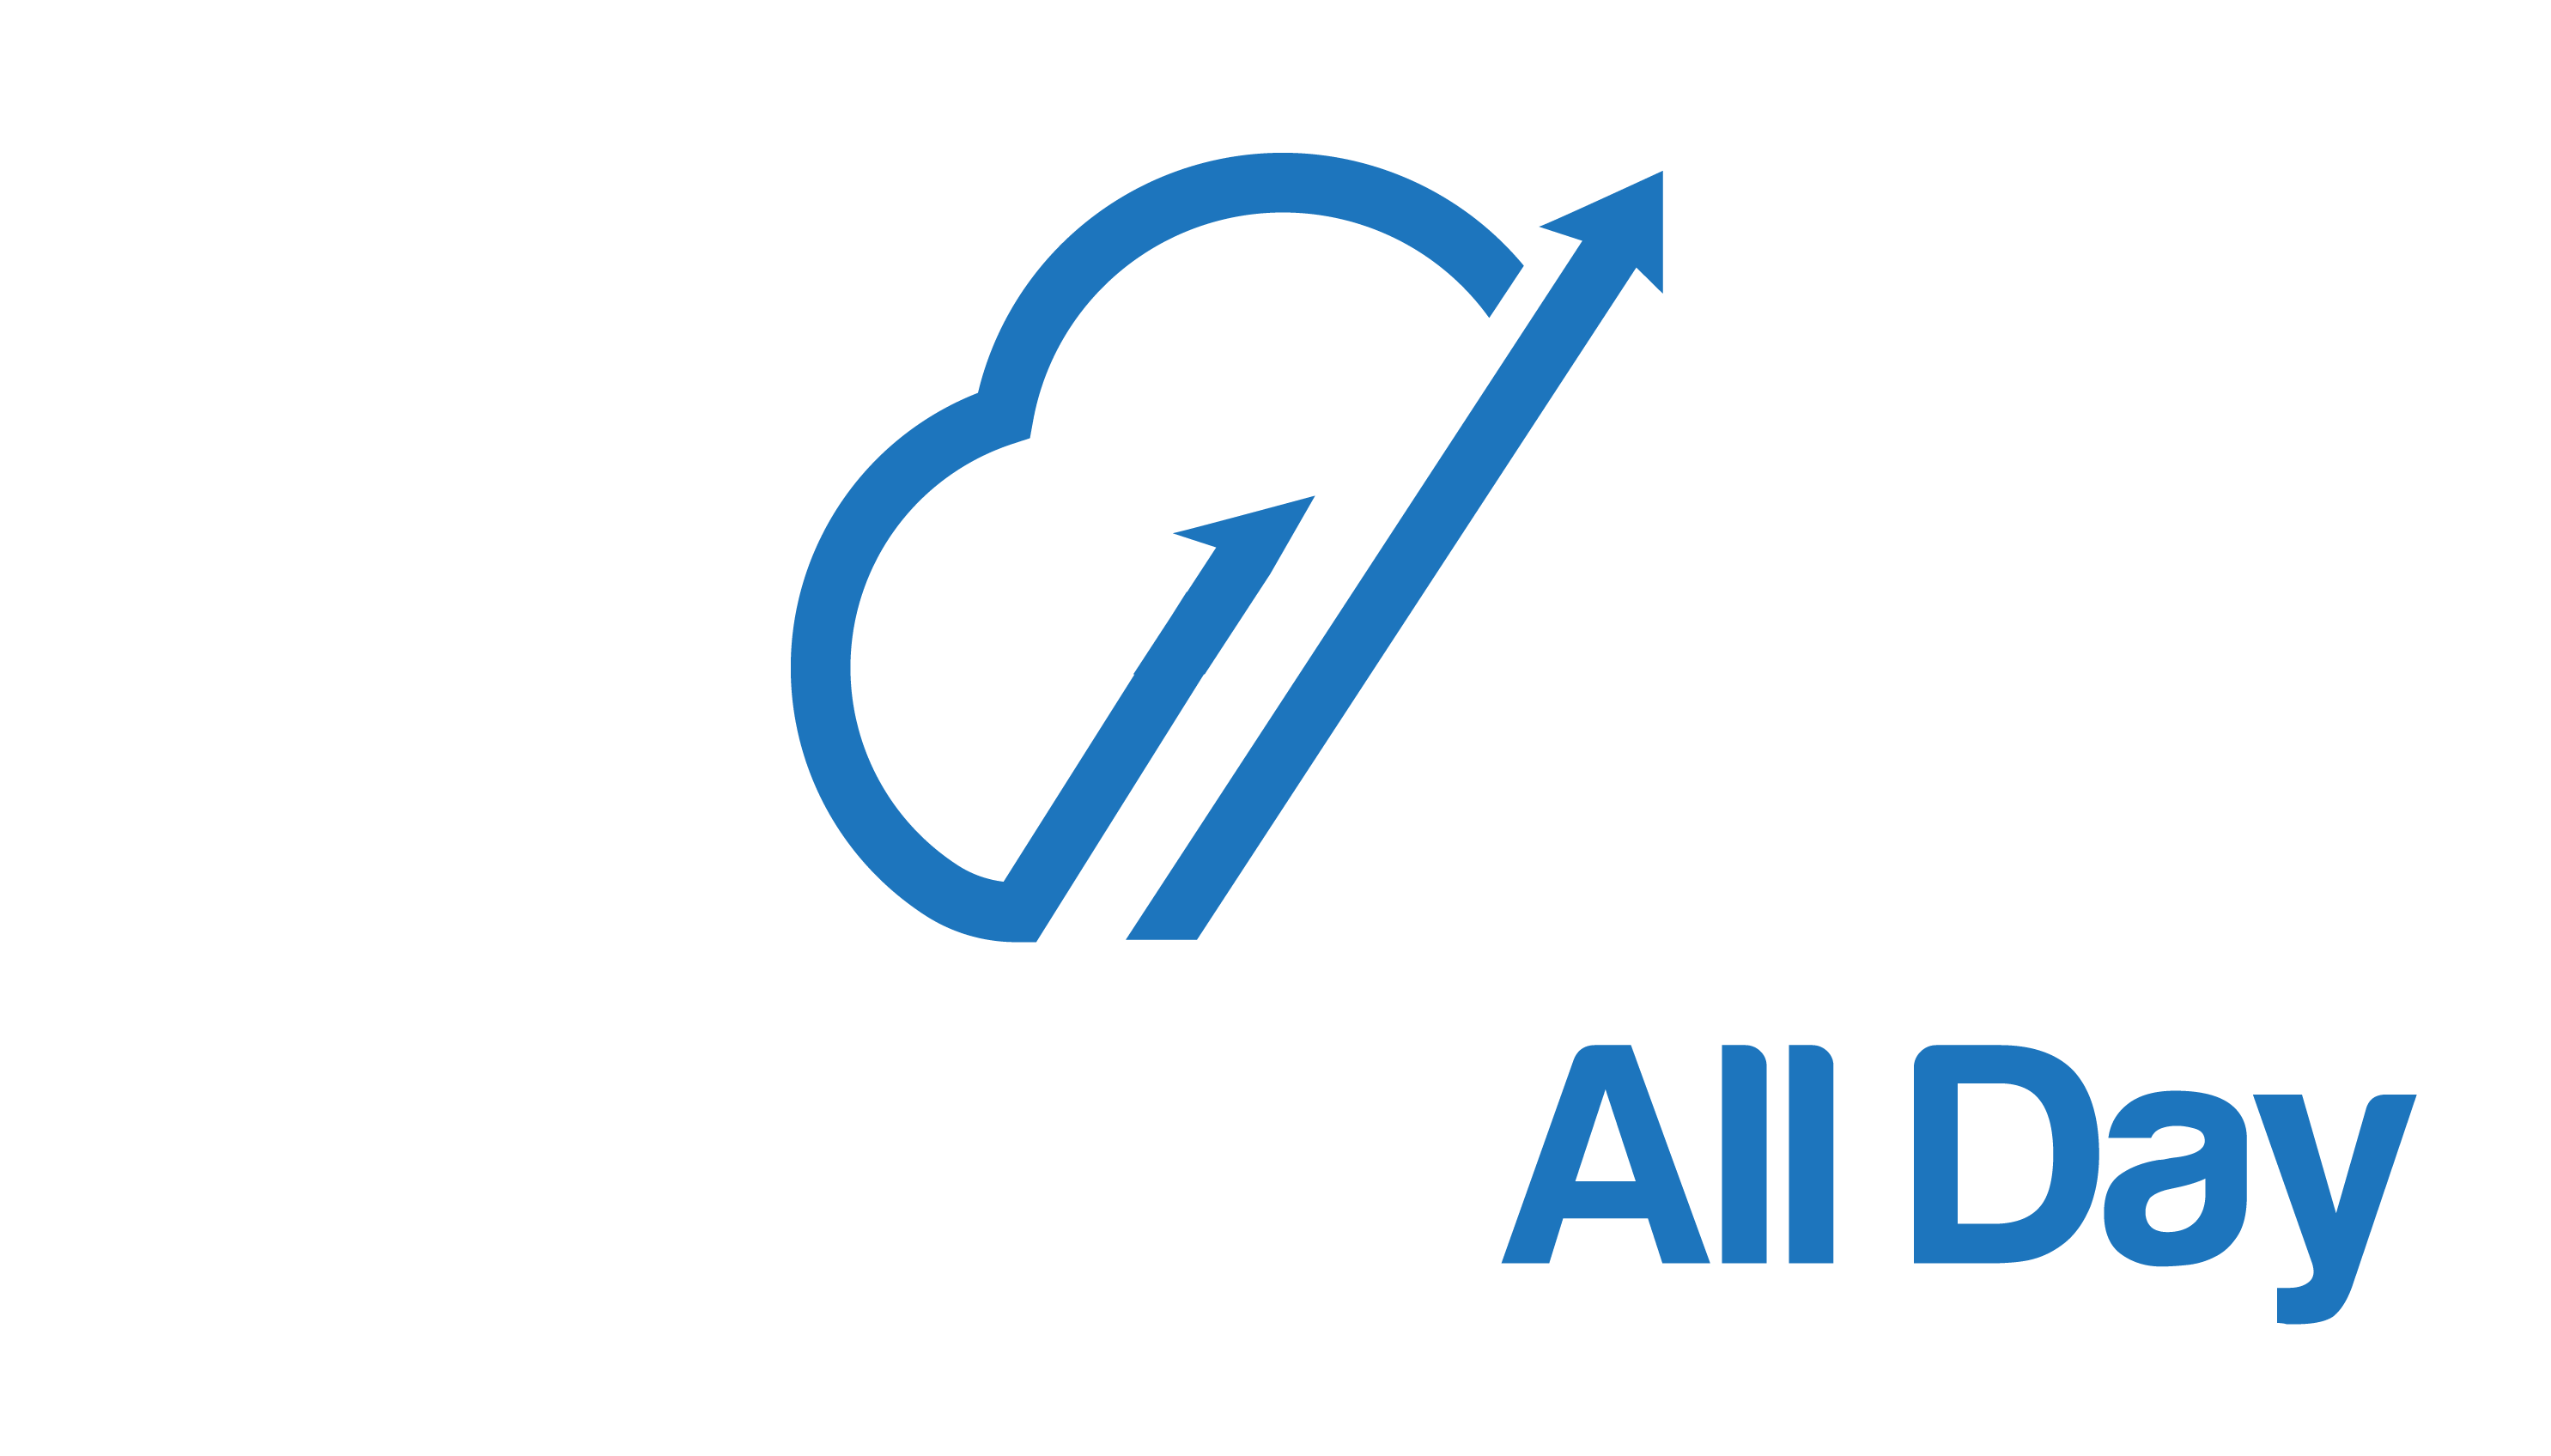 marketing-all-day-dark-background-logo